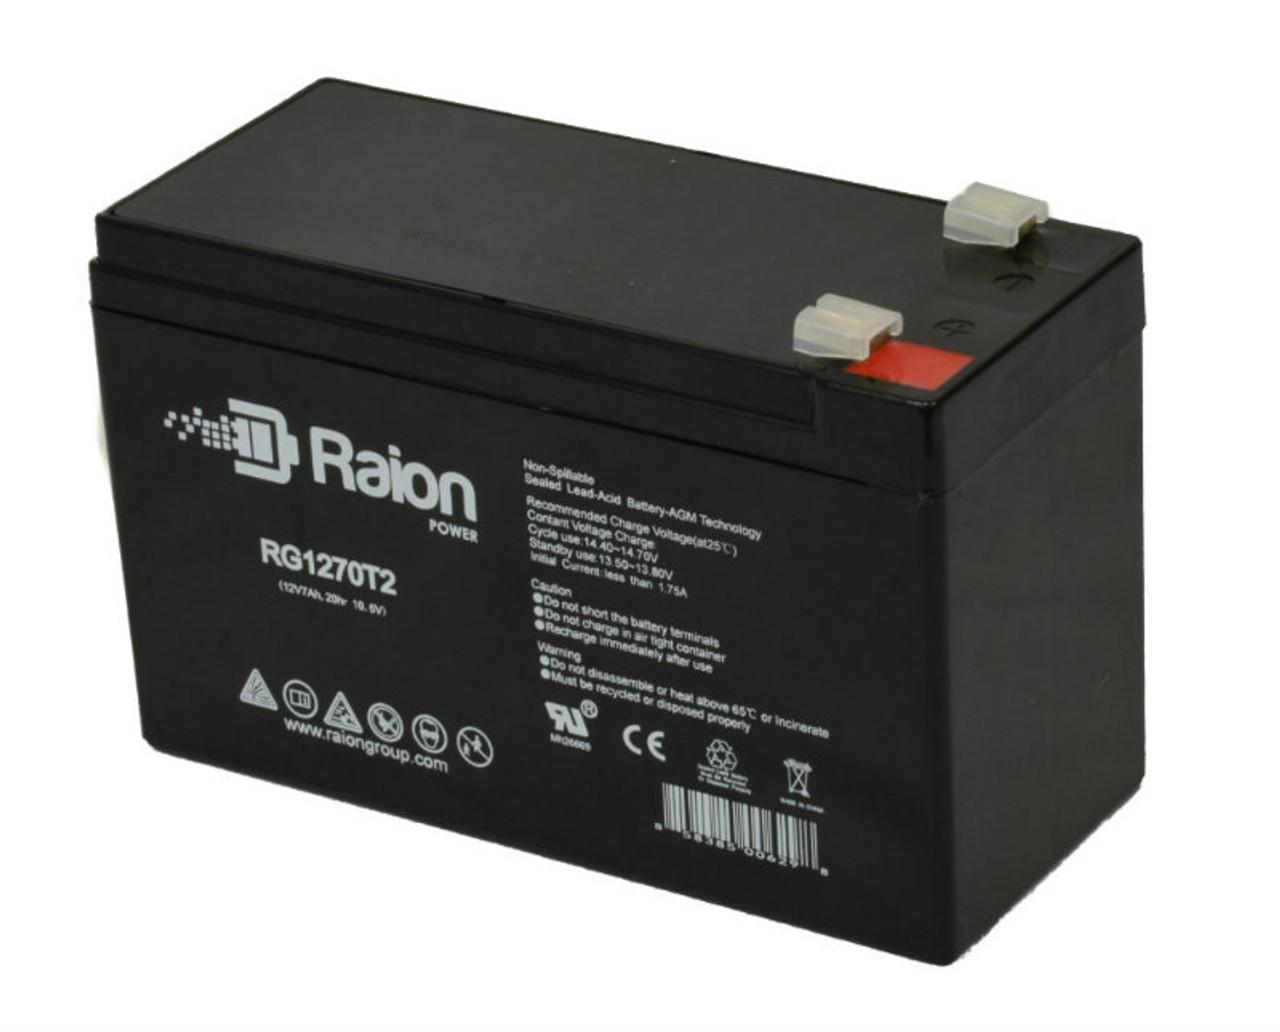 RG1270T2 Sealed Lead Acid OEM Replacement Batteries For Tripp Lite SUA1400net 8ah